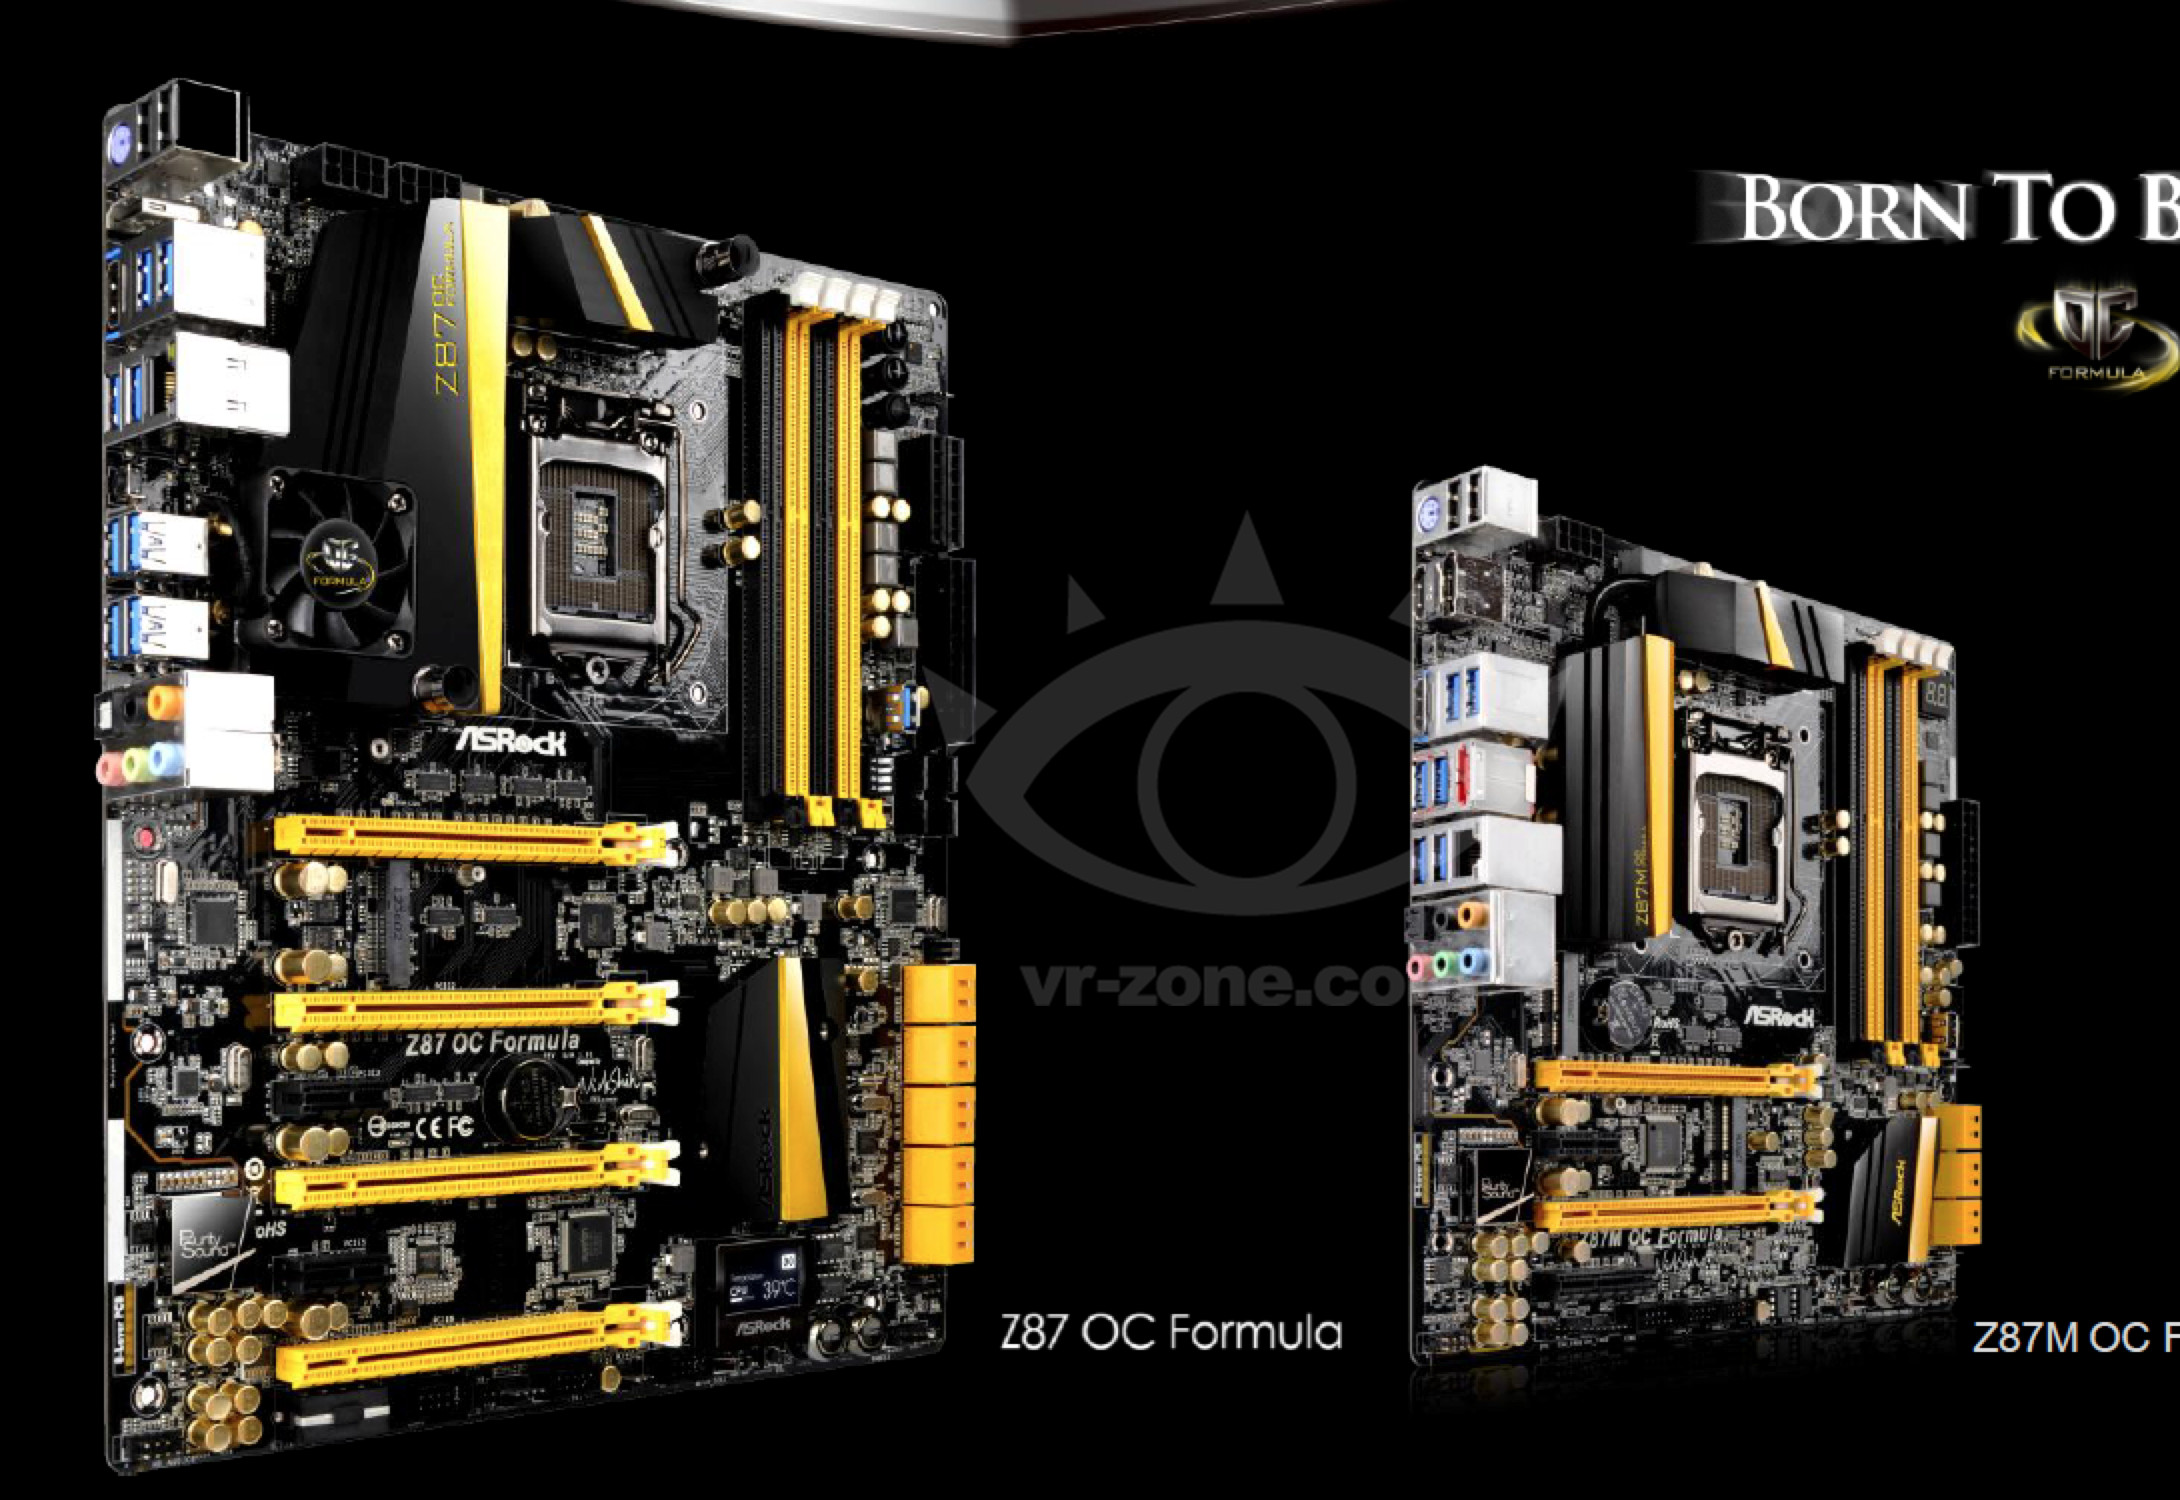 Asrock Z77 Extreme9 Intel Management Engine Driver for Mac